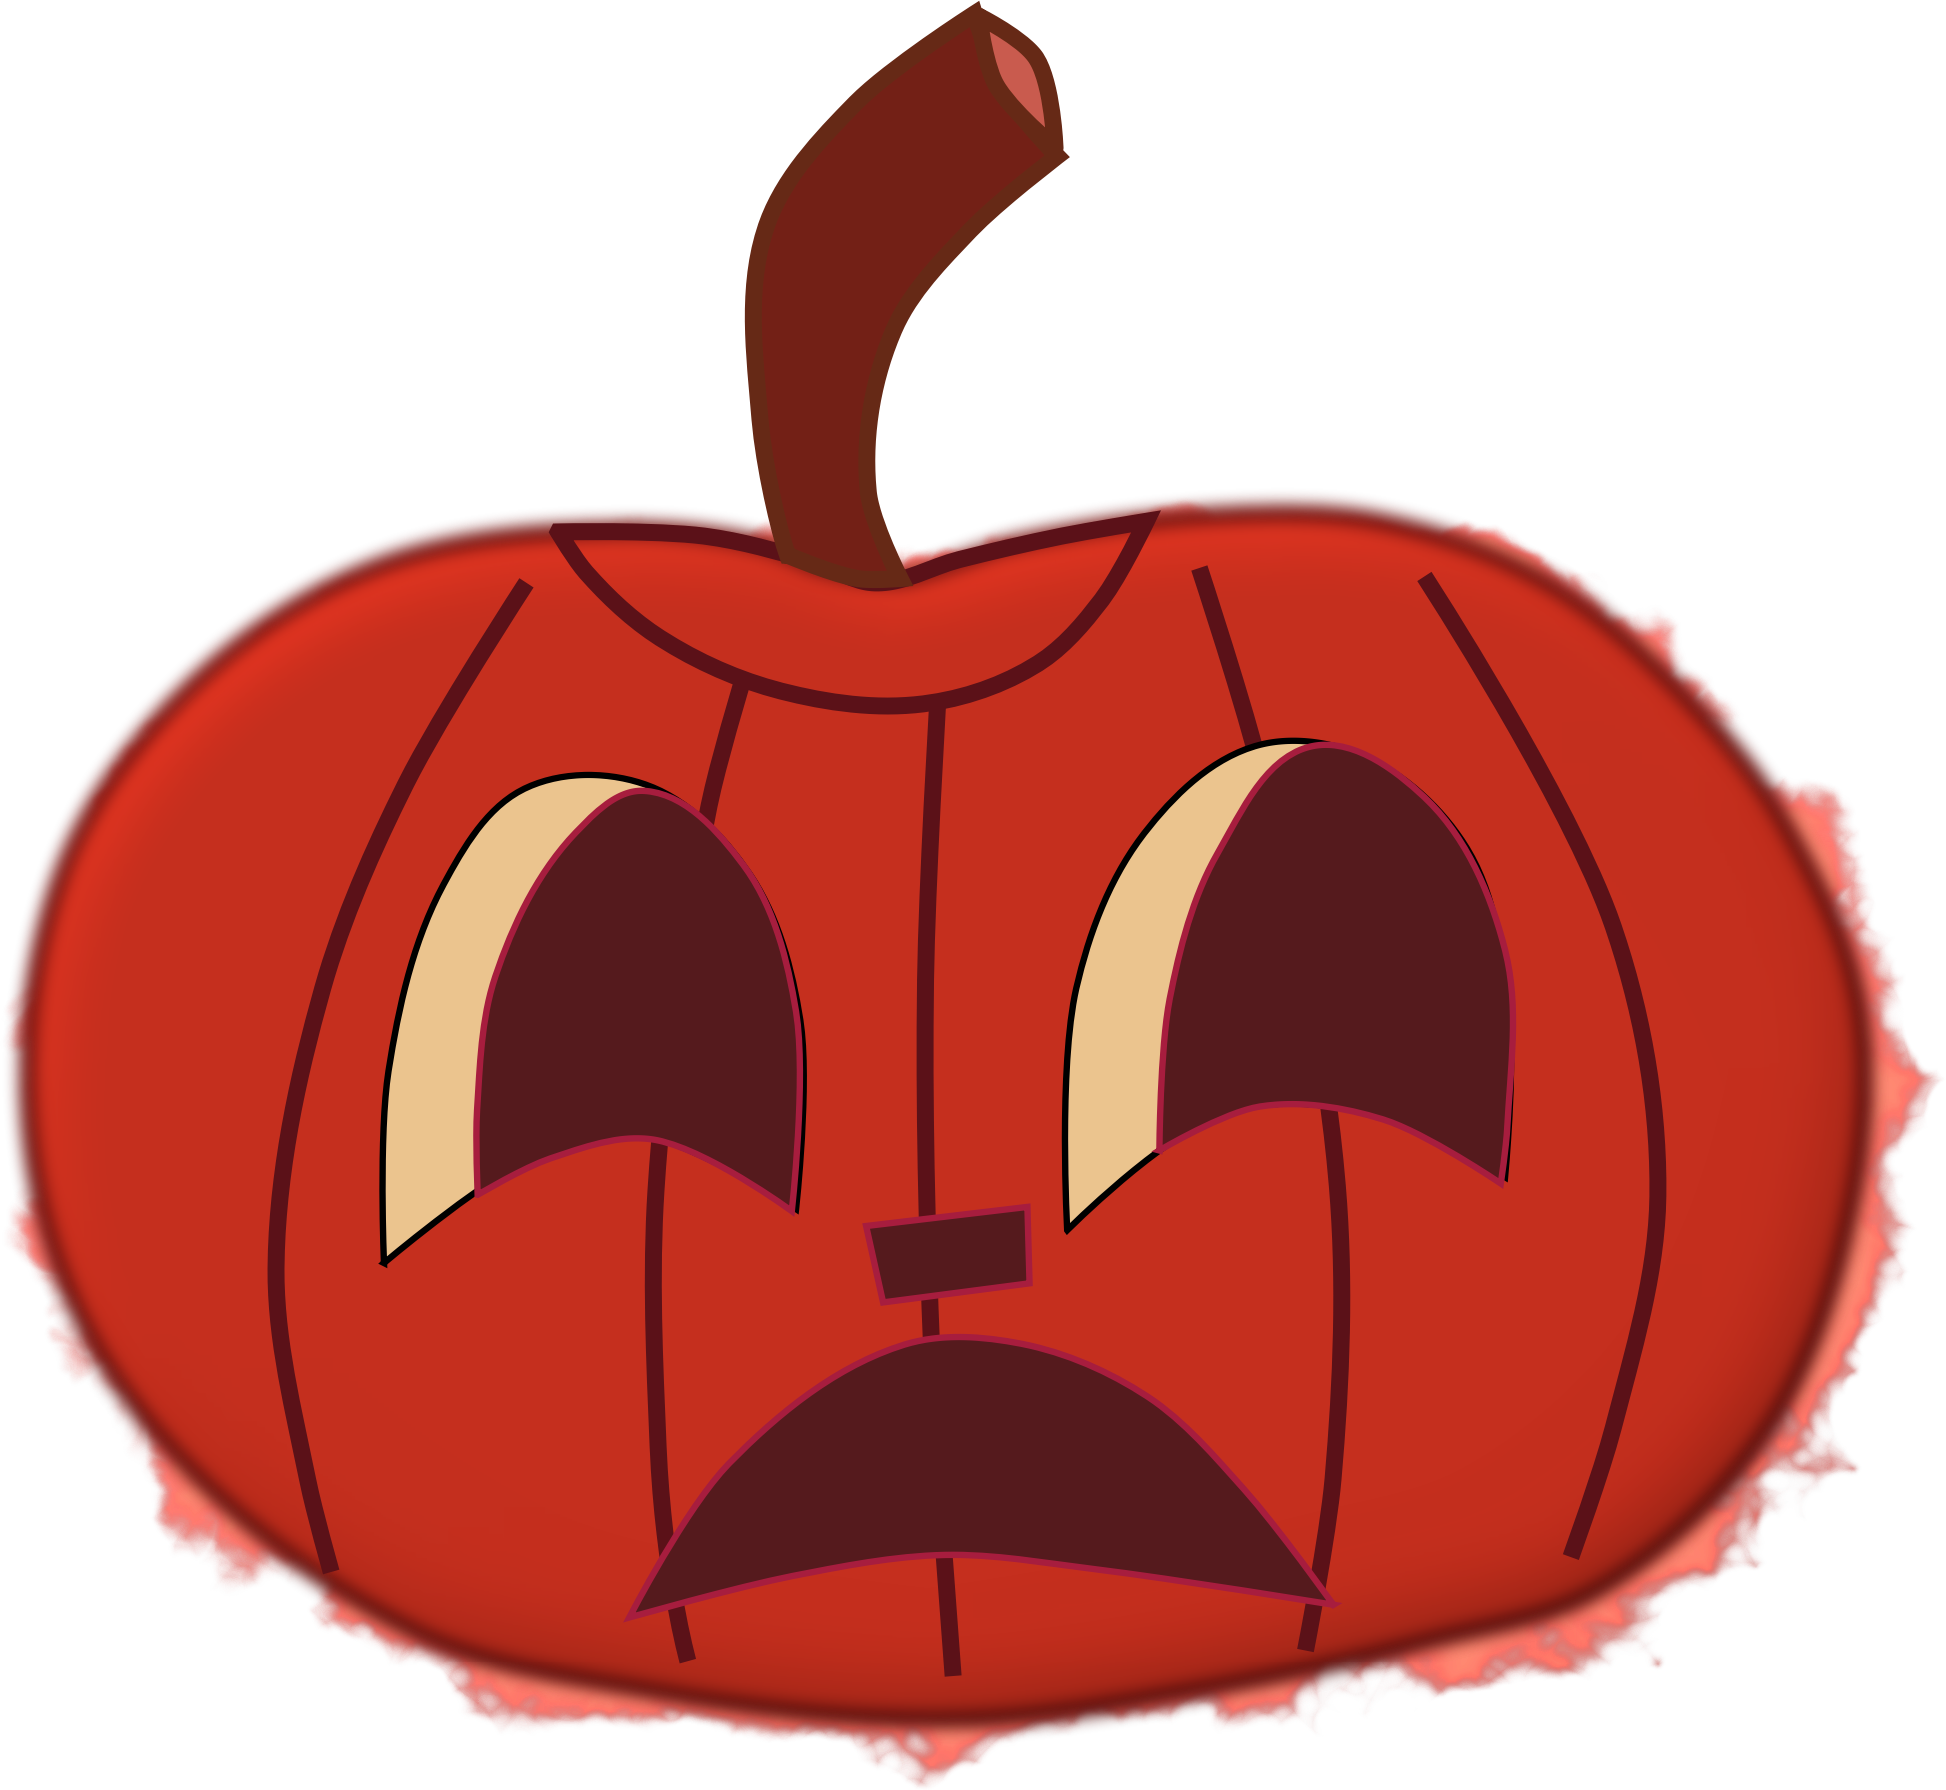 Faces clipart fruit. Halloween for pumpkins orange